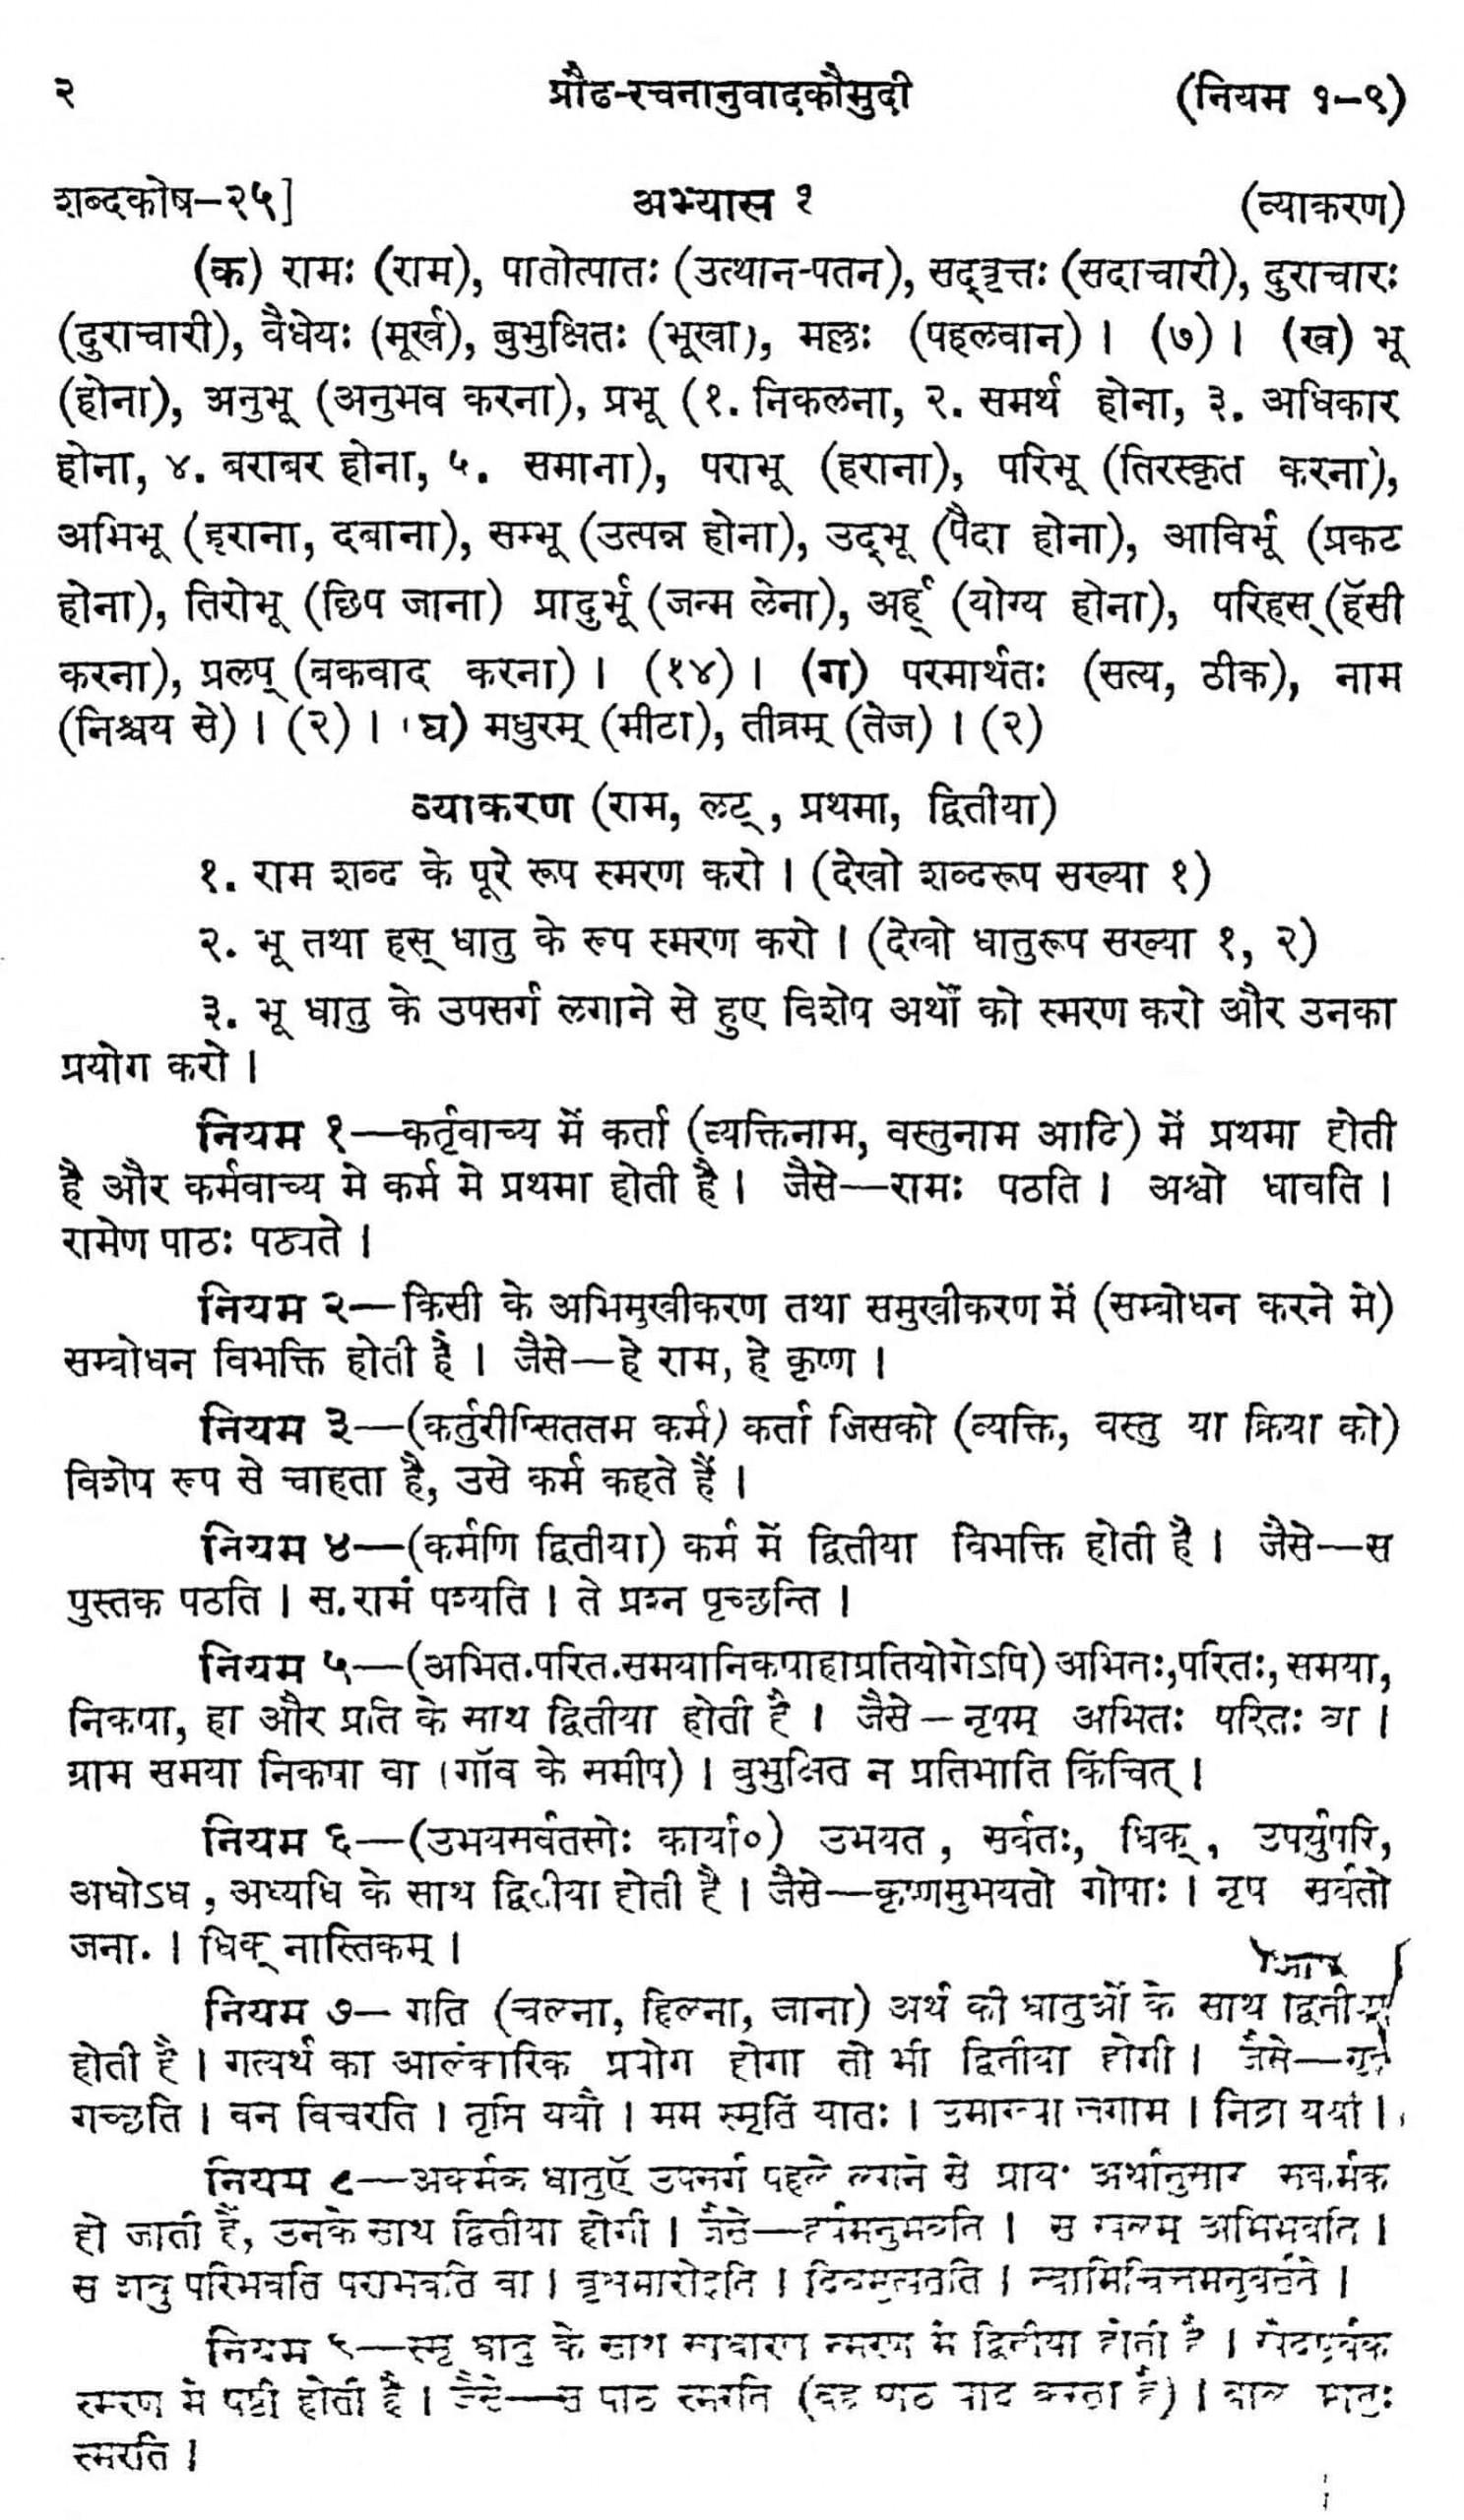 Book Image : प्रौढ रचनानुवाद कौमुदी - Praud Rachnanuwad Kaumudi